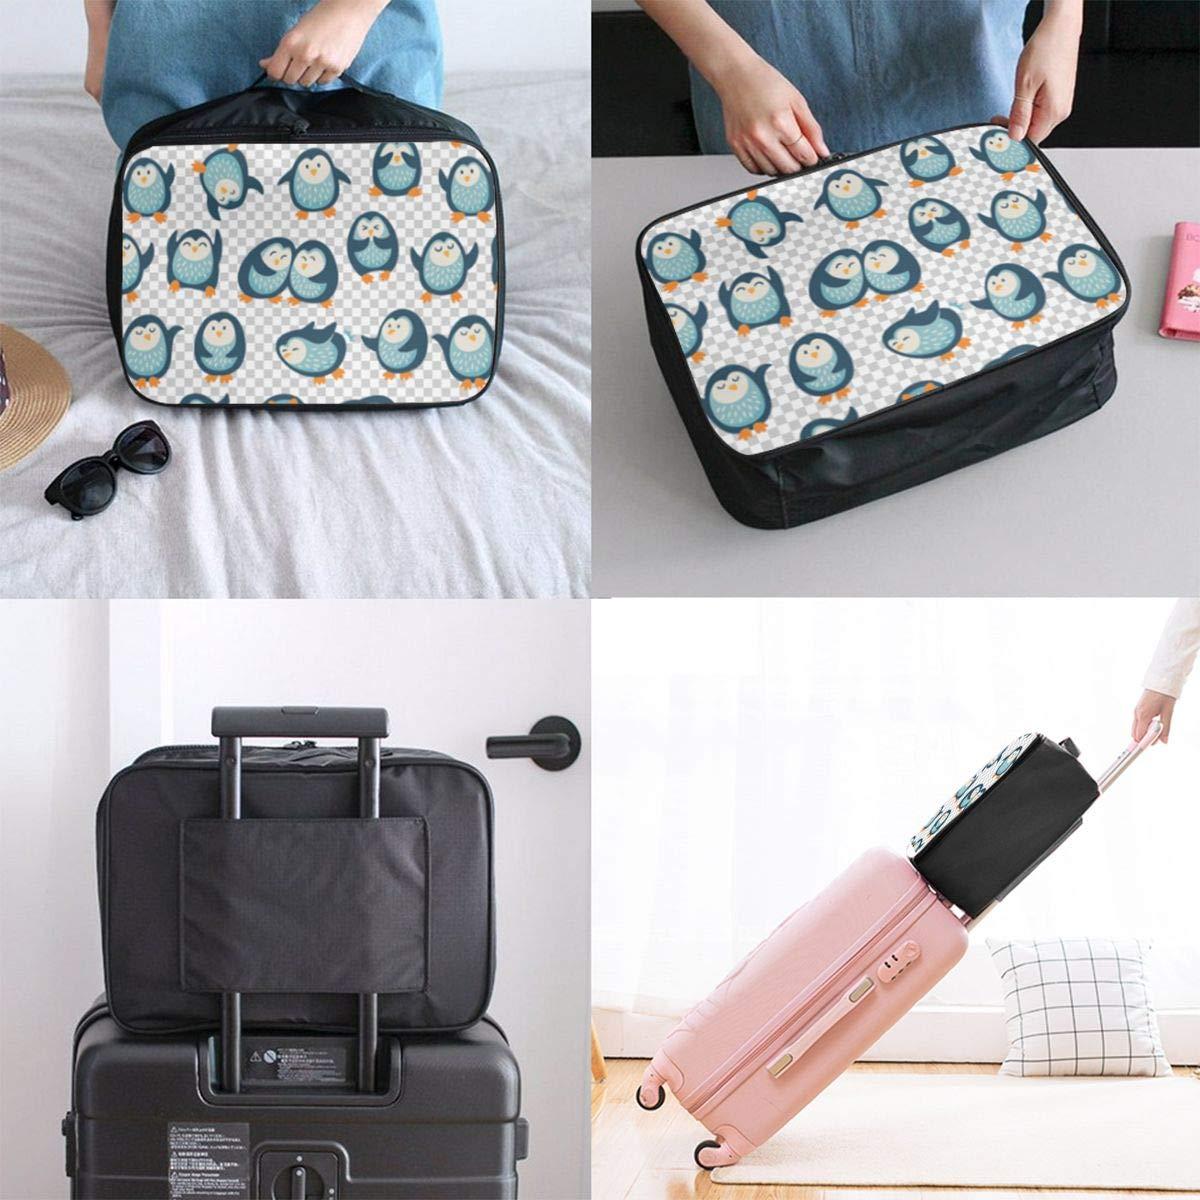 ADGAI Funny Penguins Canvas Travel Weekender Bag,Fashion Custom Lightweight Large Capacity Portable Luggage Bag,Suitcase Trolley Bag